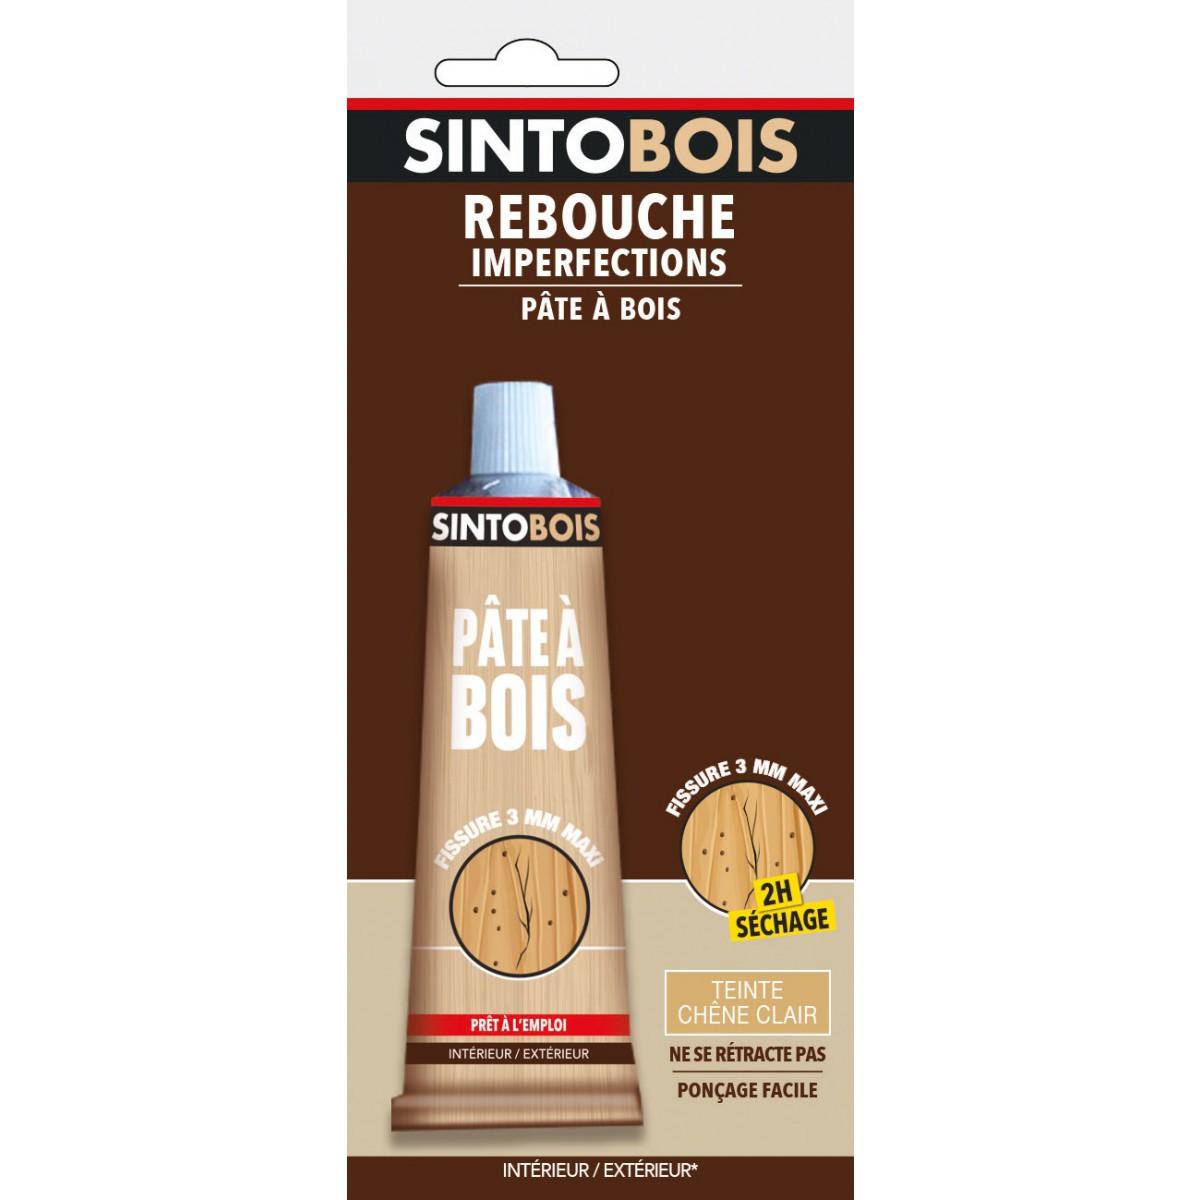 Sintobois rebouche imperfections Sinto - Chêne clair - 80 g